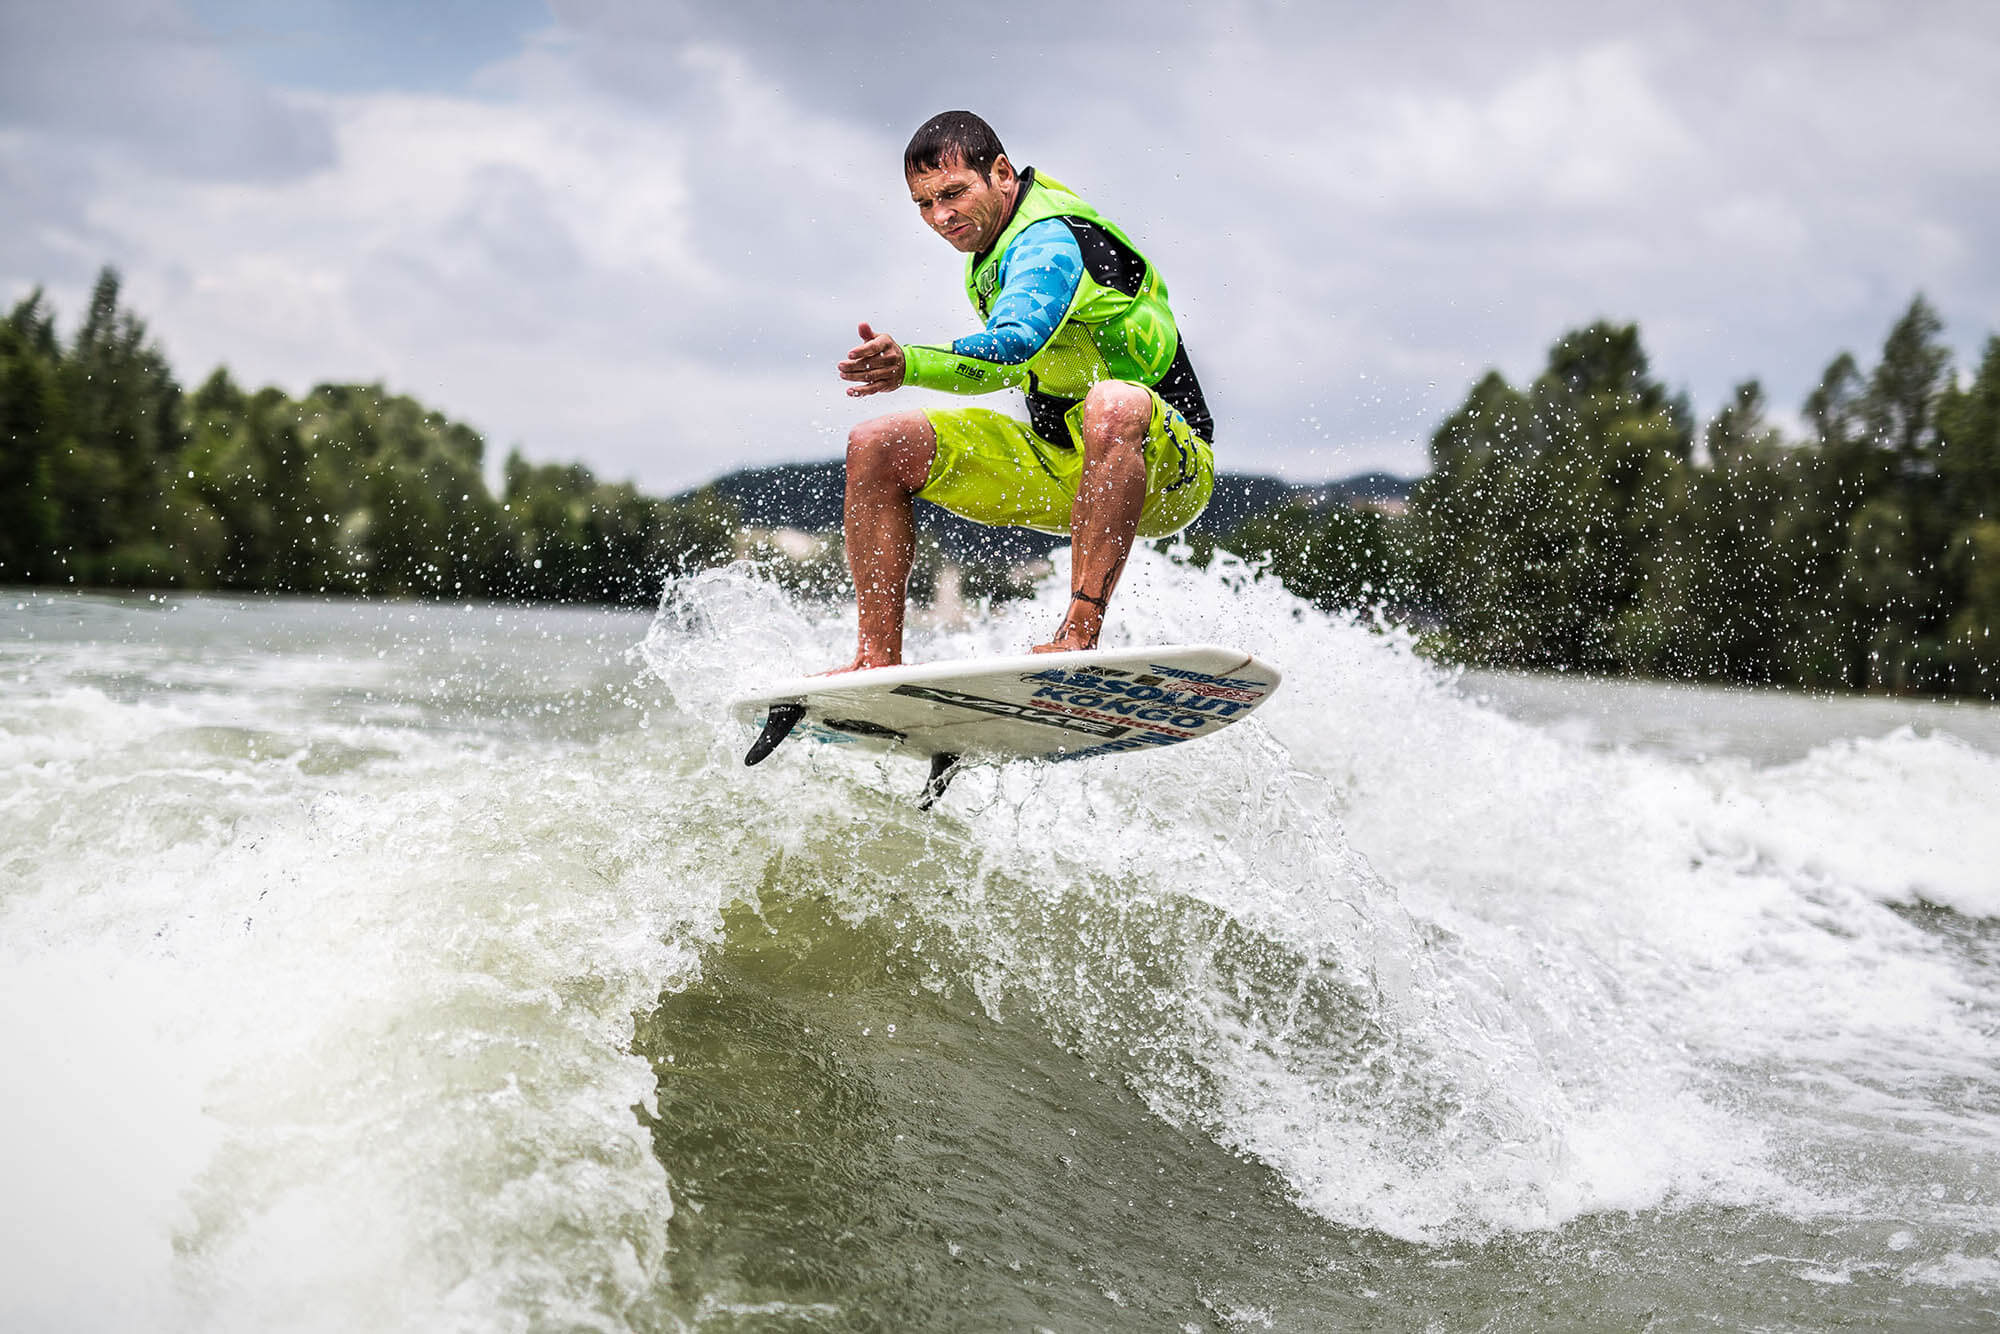 wakesurf wake surfing motorboat fetzy world action sports photography sportfotografie flap photography fotograf philipp greindl photographer linz austria